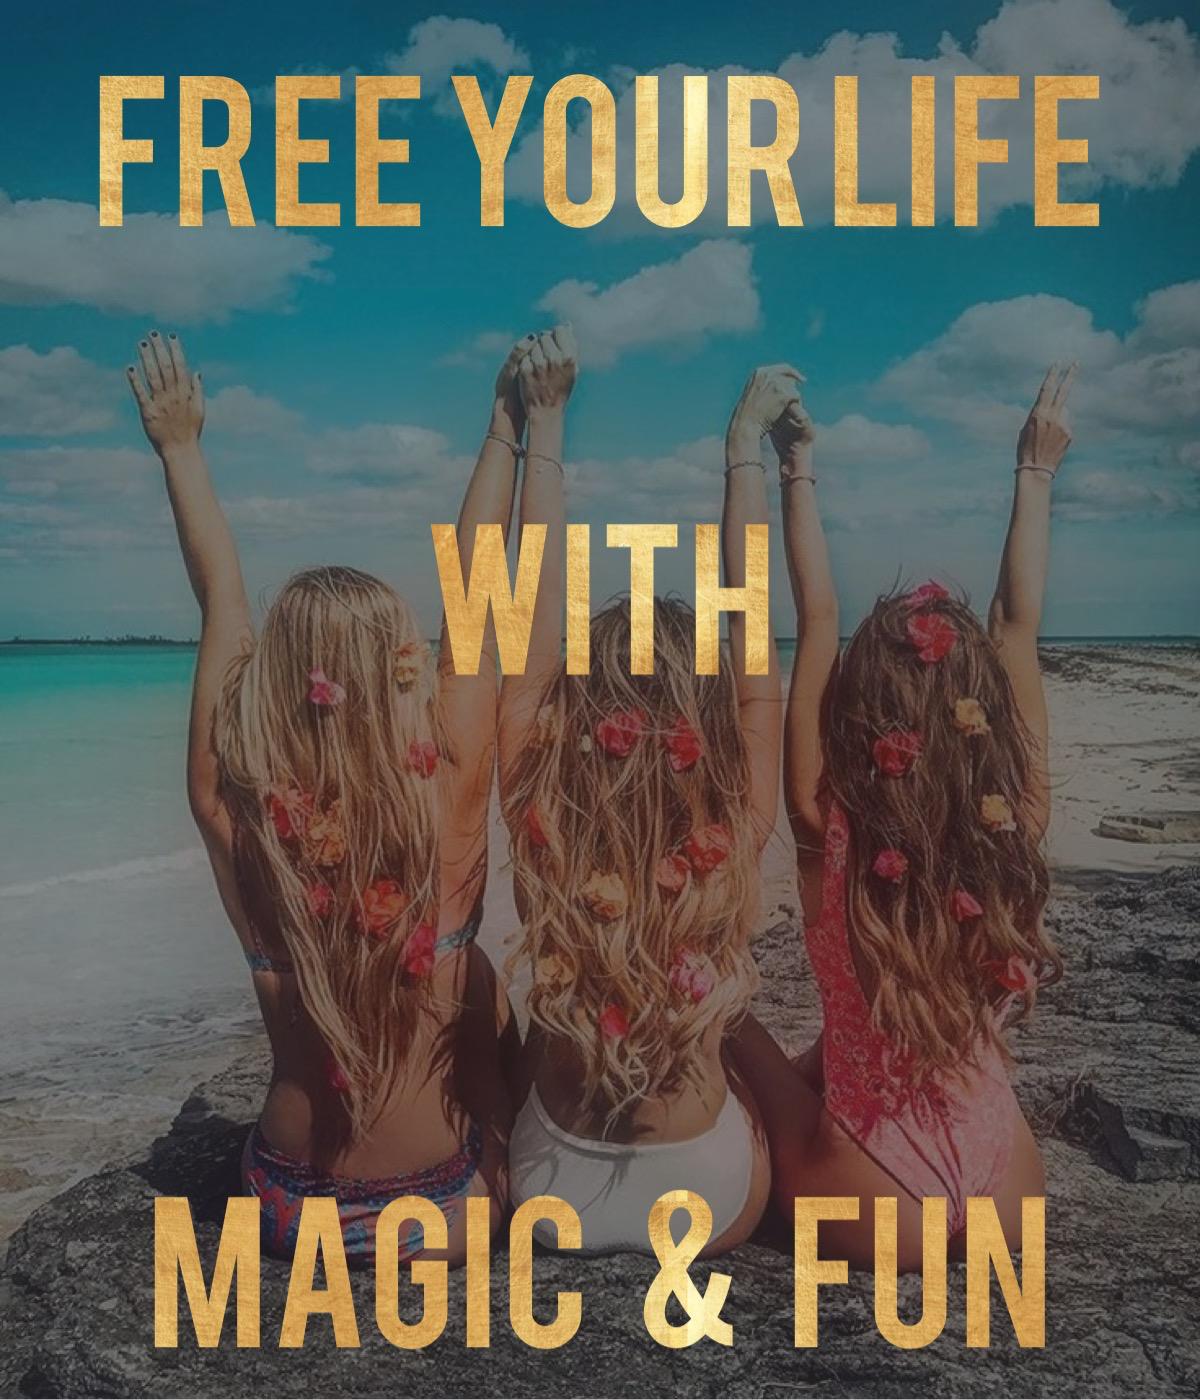 be free, live free